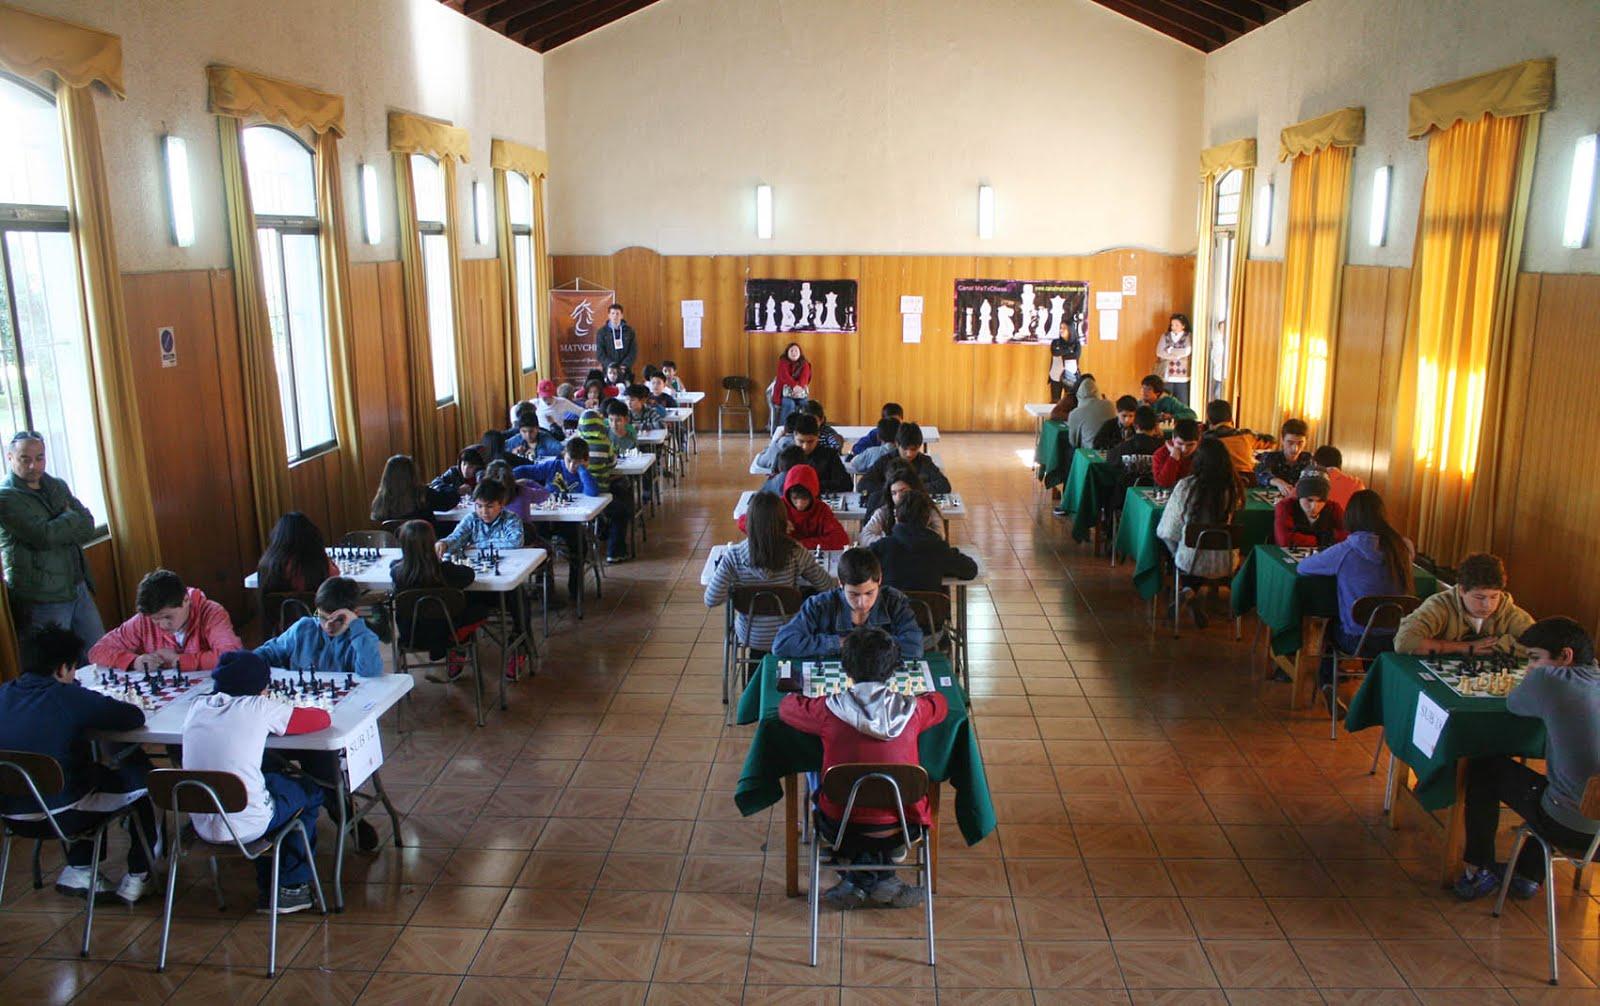 Torneo Escolar C.Inmaculada de Lourdes, Viña del Mar.